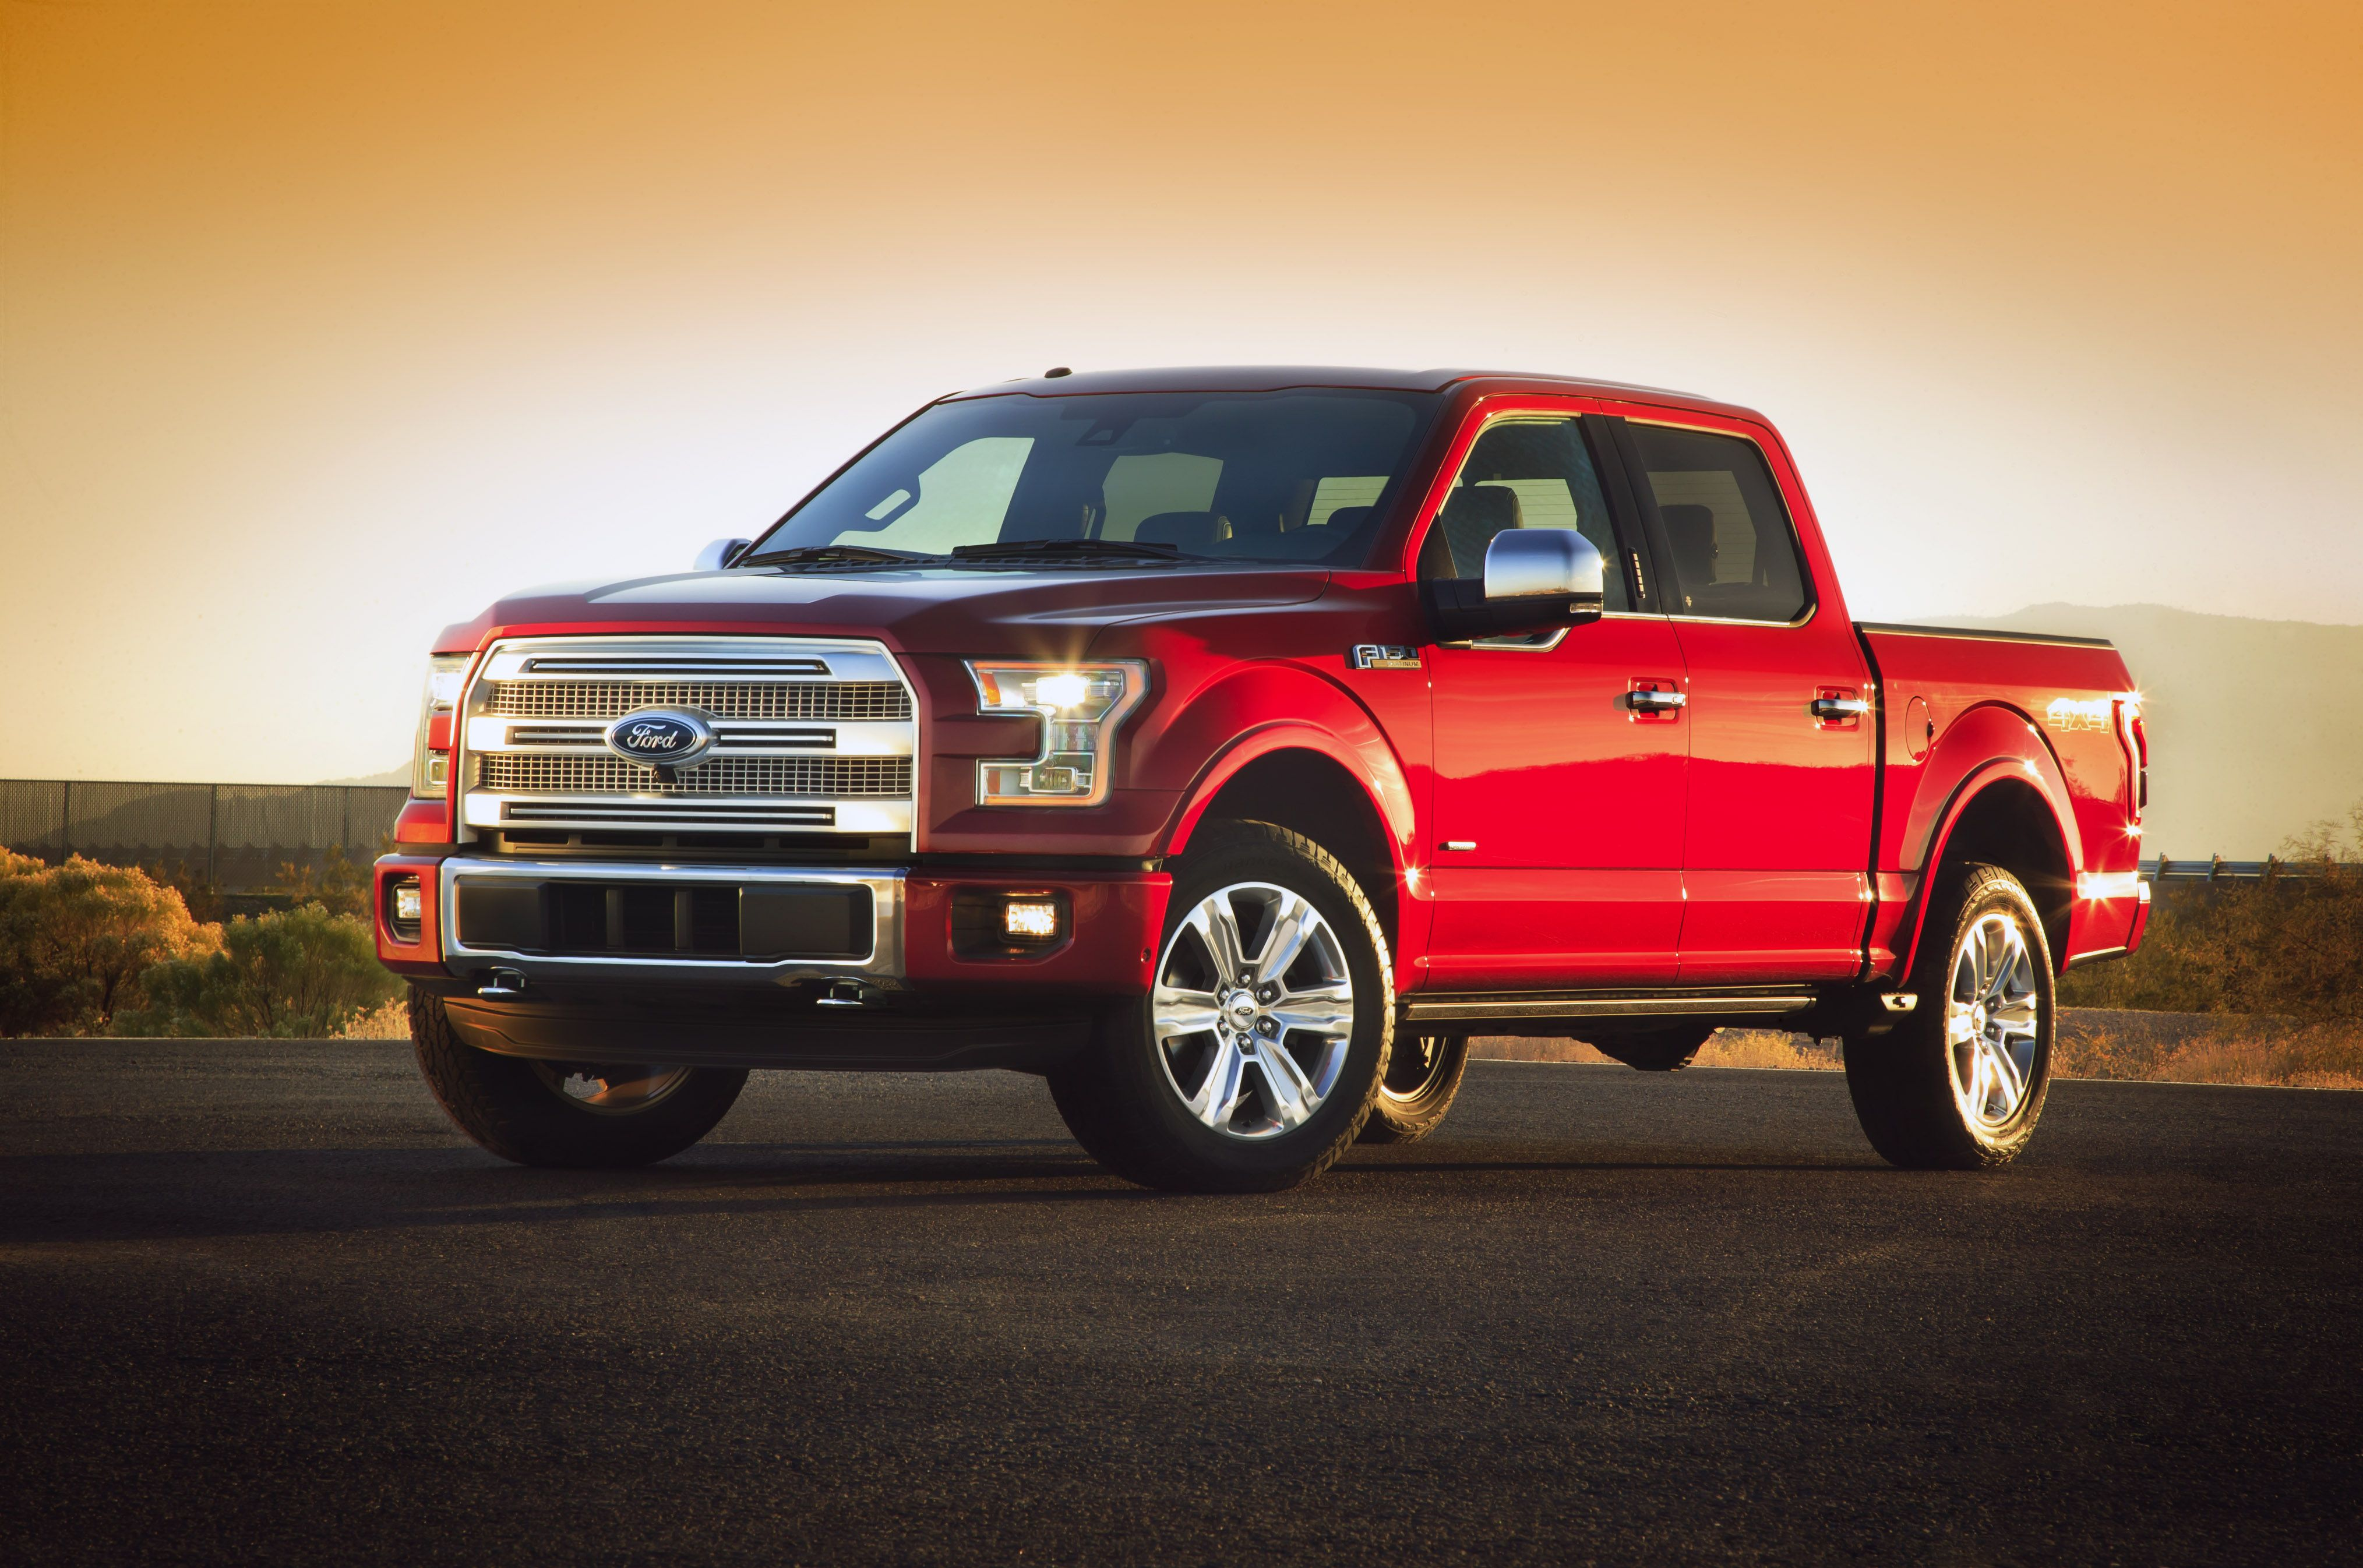 2016 S Most Loved Cars Trucks At Driver S Auto Mart 2018 Ford F150 F150 Truck Ford Trucks